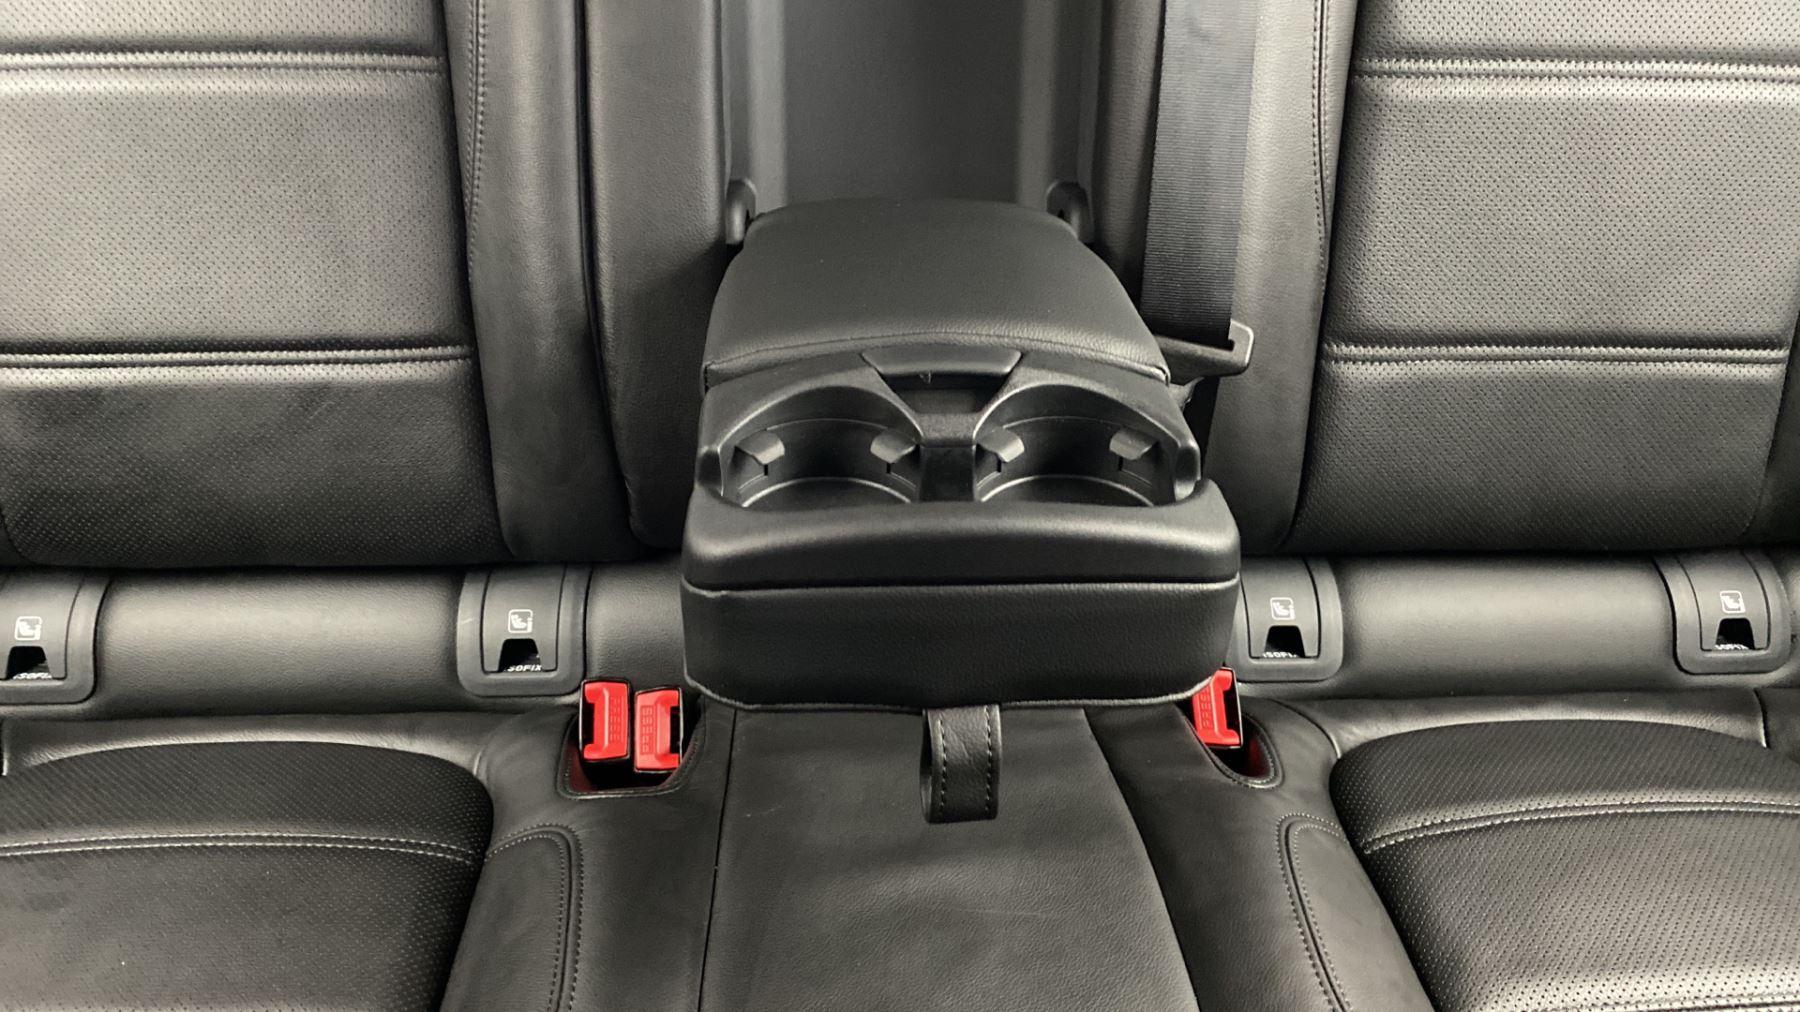 Jaguar E-PACE 2.0d SE AWD - Meridian Sound System - Powered Seats - Satellite Navigation image 29